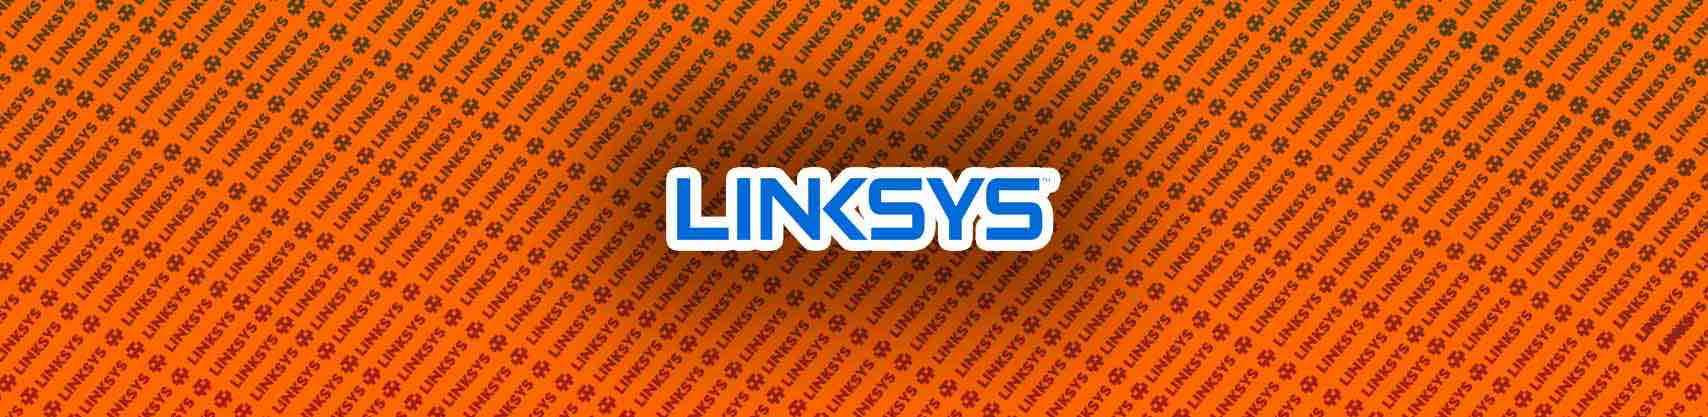 Linksys WRT160N Manual